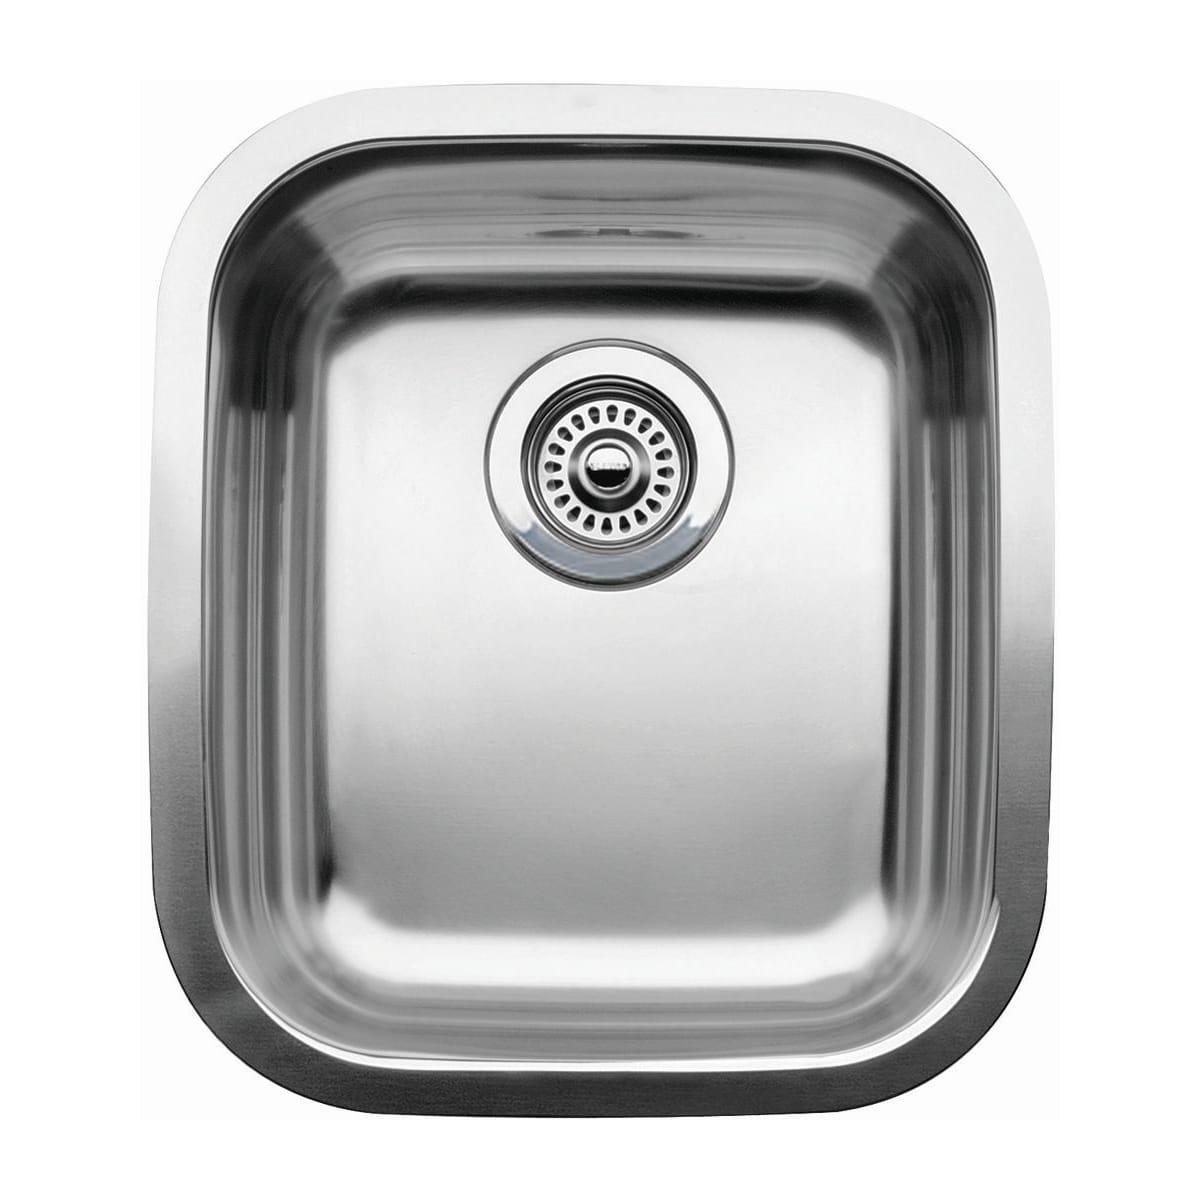 "Blanco Wave Single Basin Stainless Steel Undermount Bar Sink 15-9/16"" x 17-3/4"""